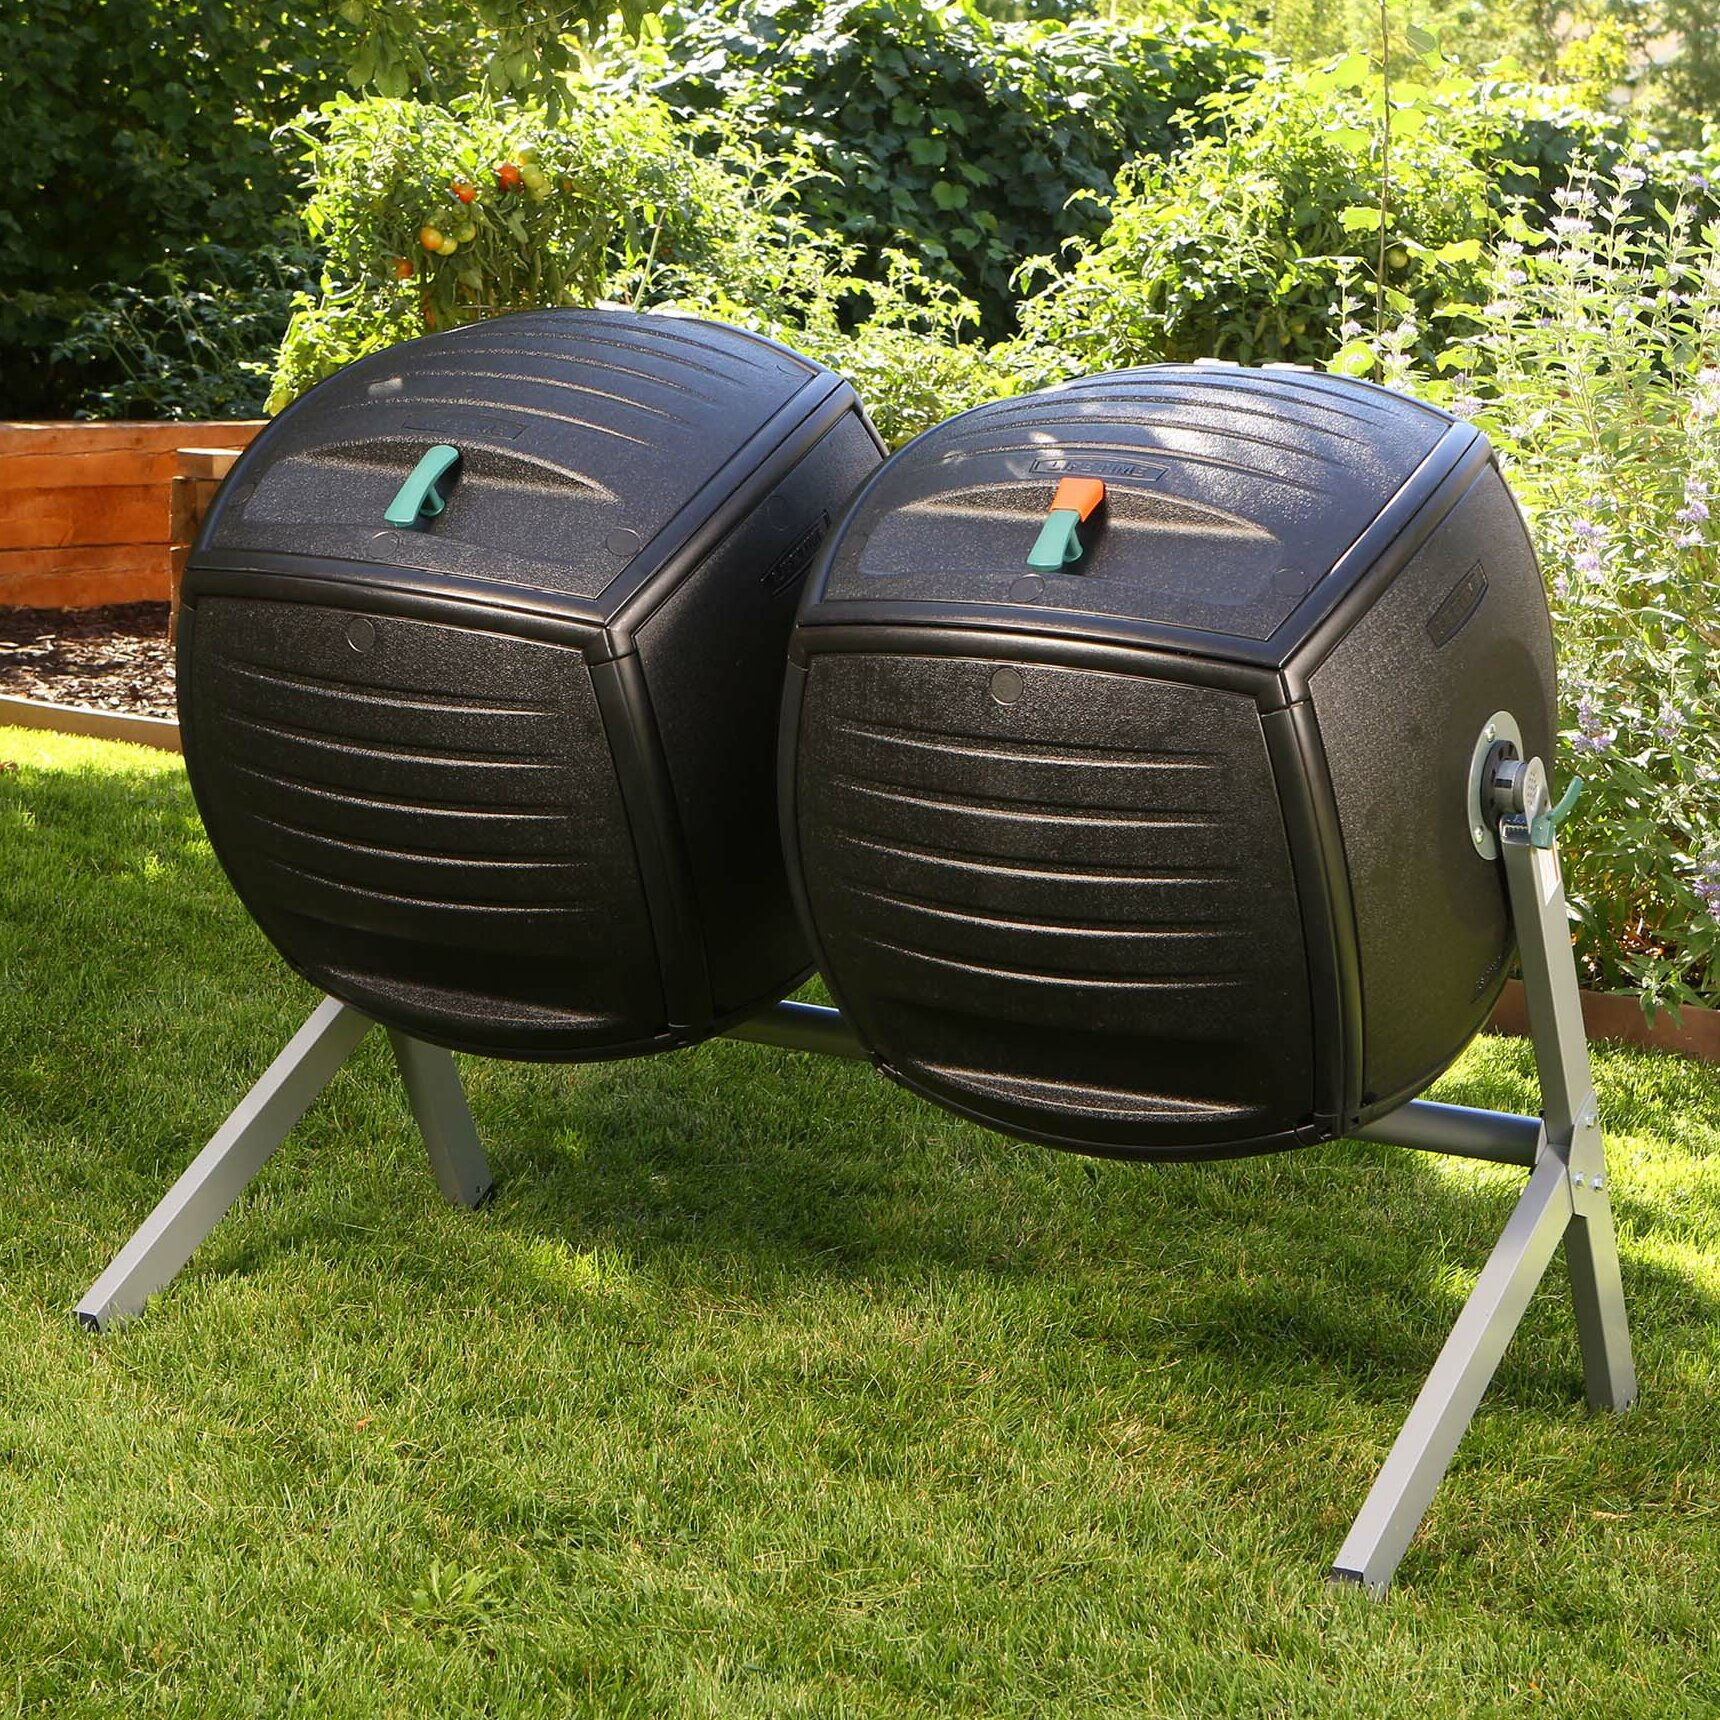 Double Bin 189 3L Compost Tumbler